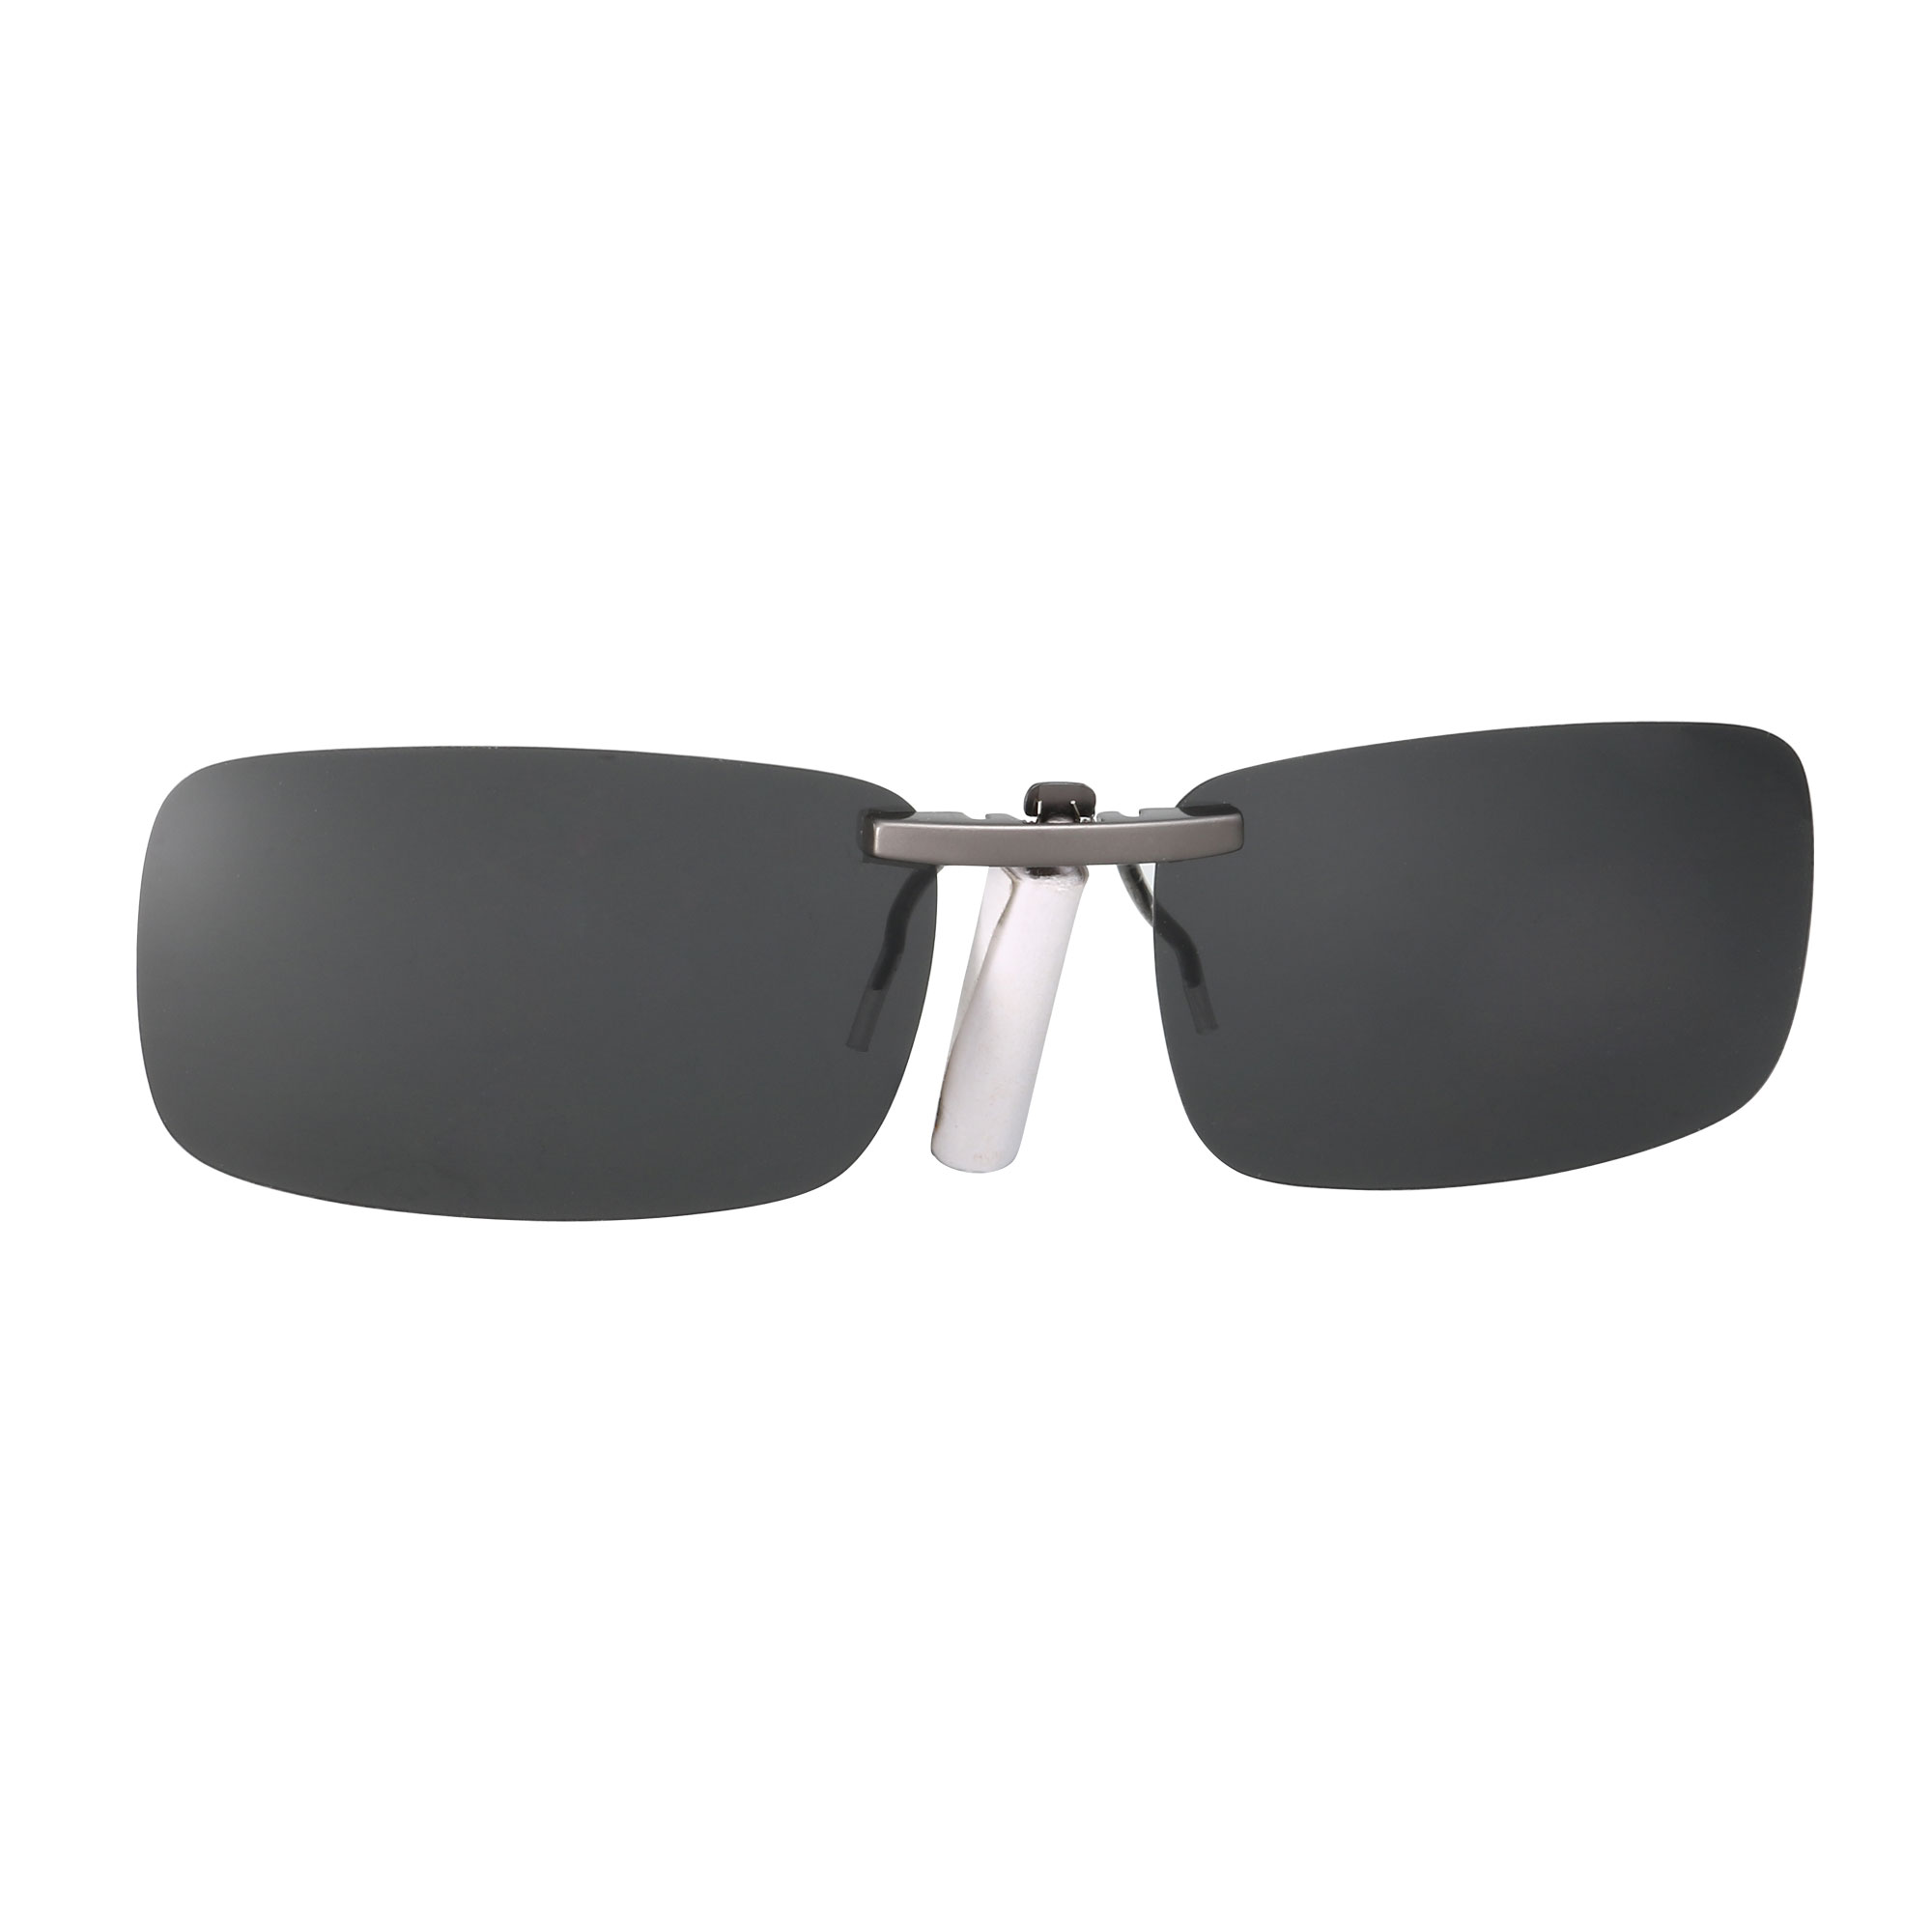 Unisex Clear Black Polarized Lens Sunglasses Clip On Eyewear Eyeglasses